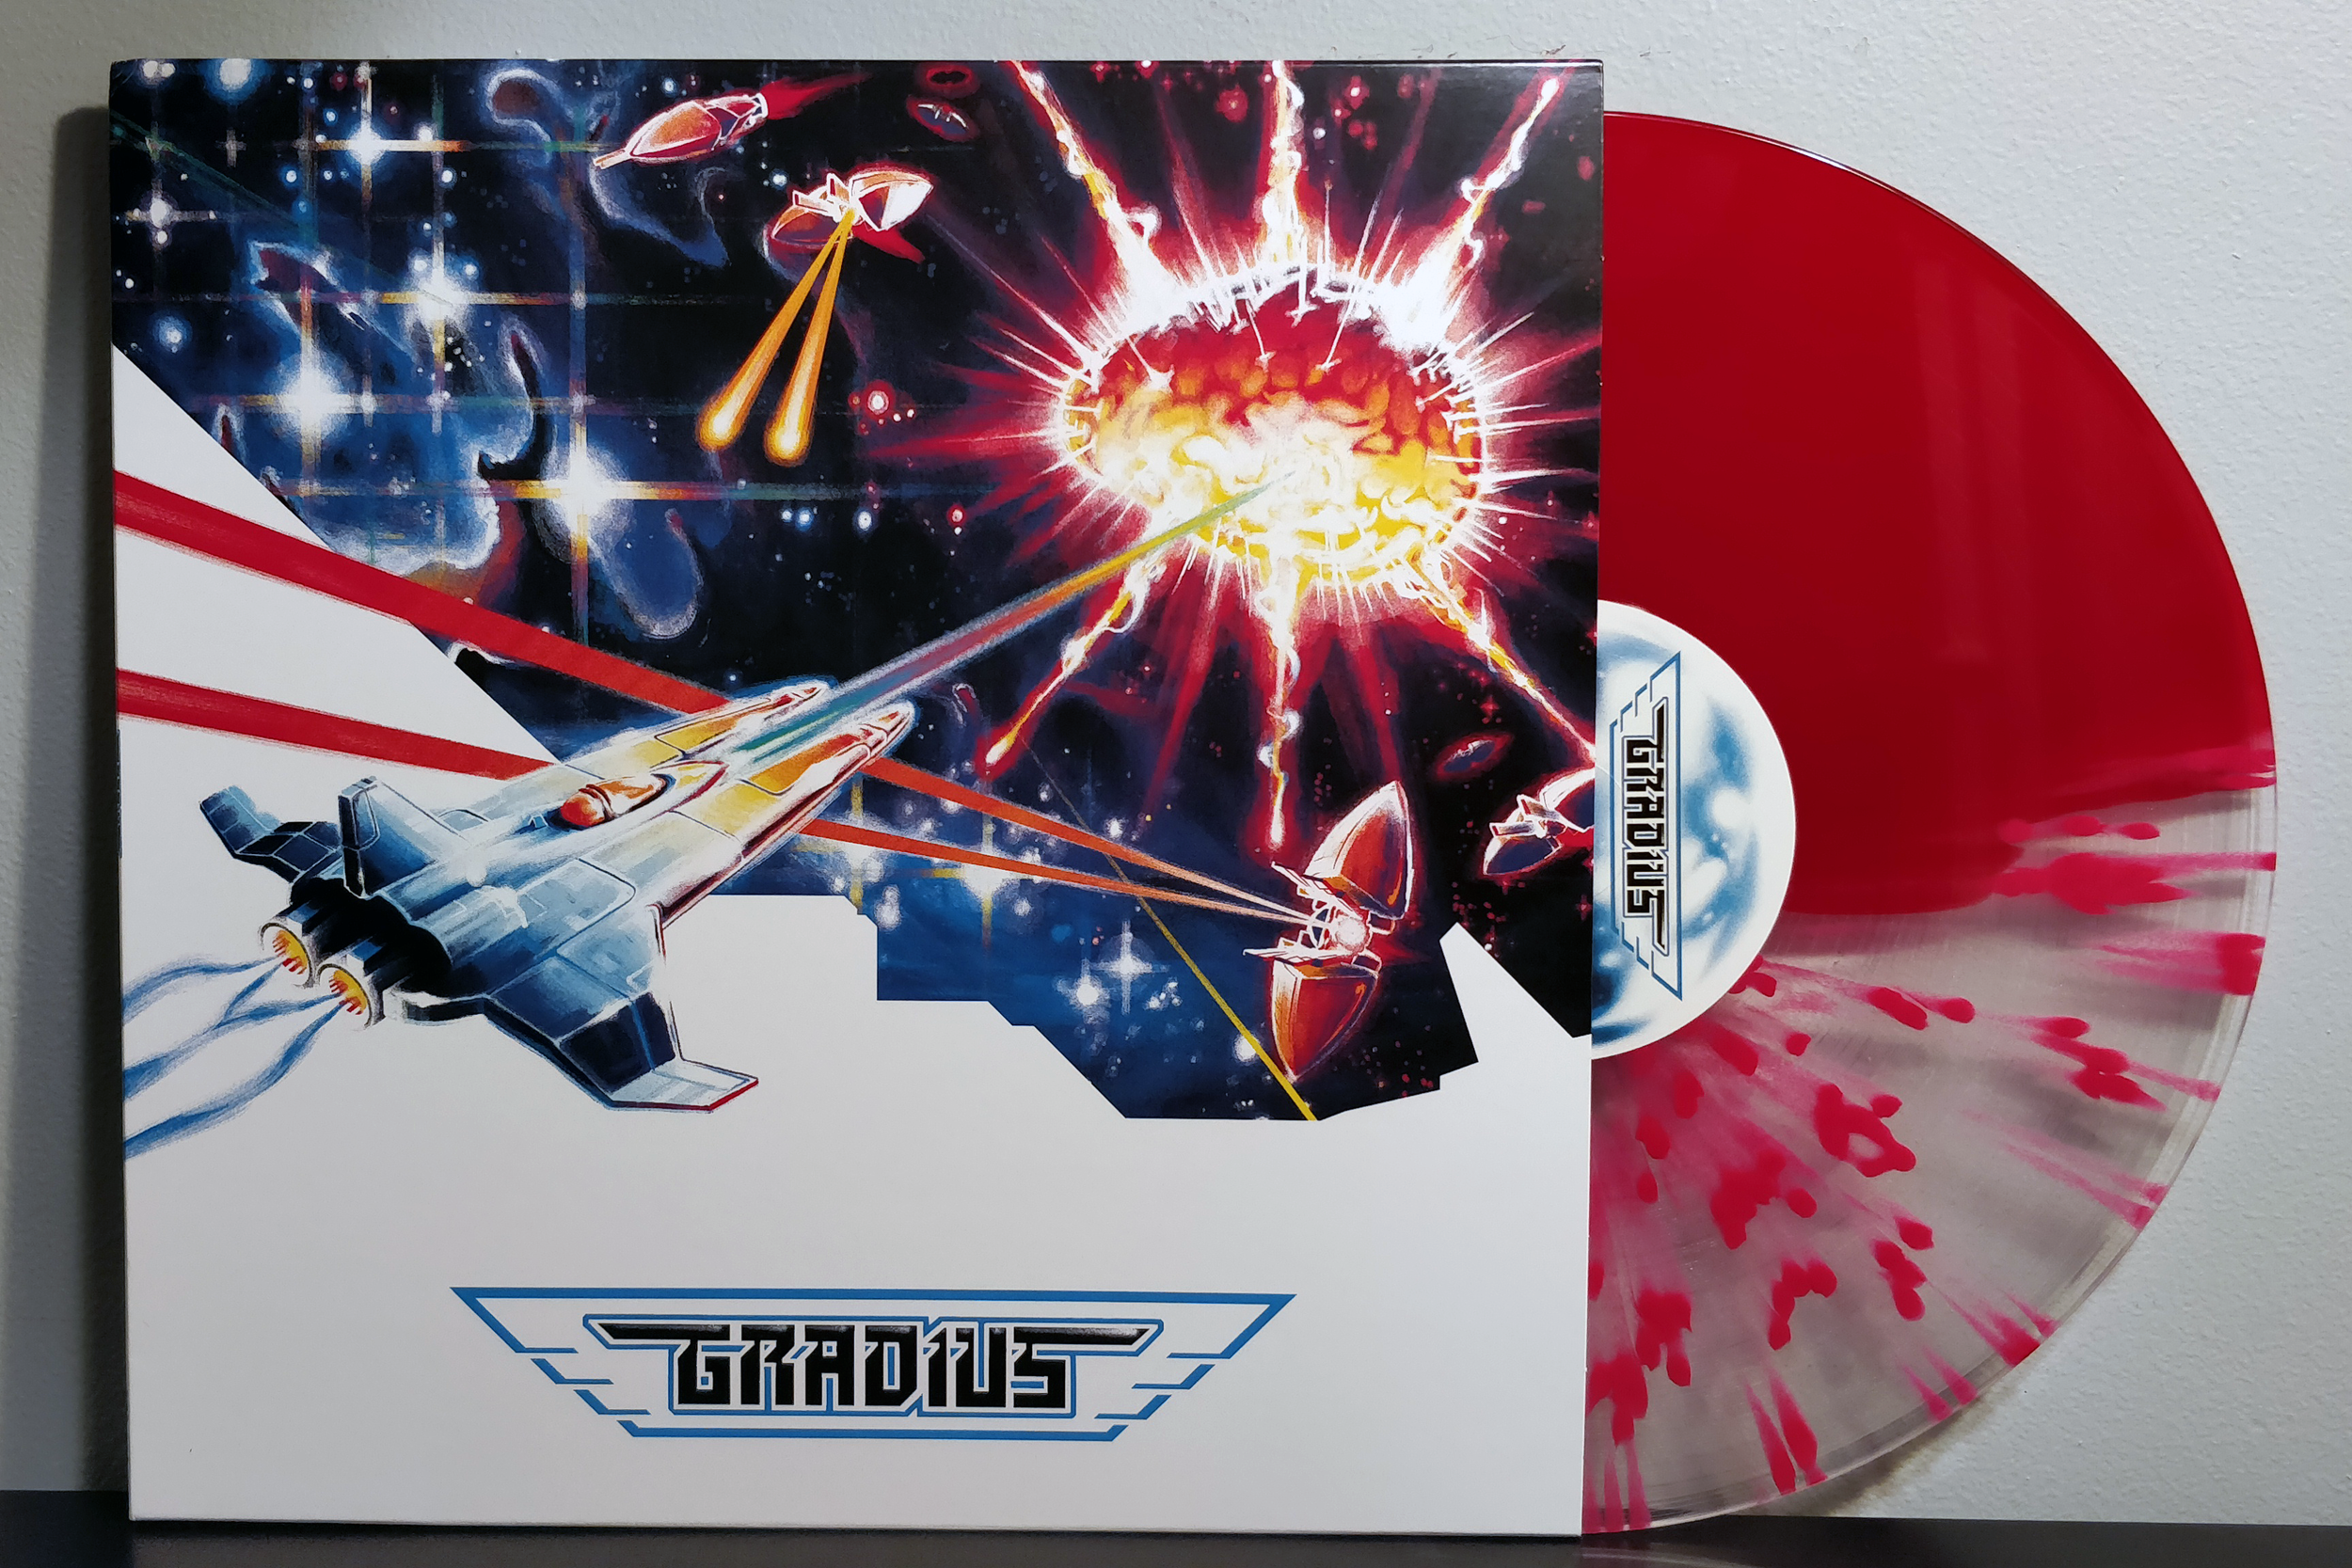 Gradius by Konami Kukeiha Club pressed on split splatter and transparent red by Ship to Shore PhonoCo.